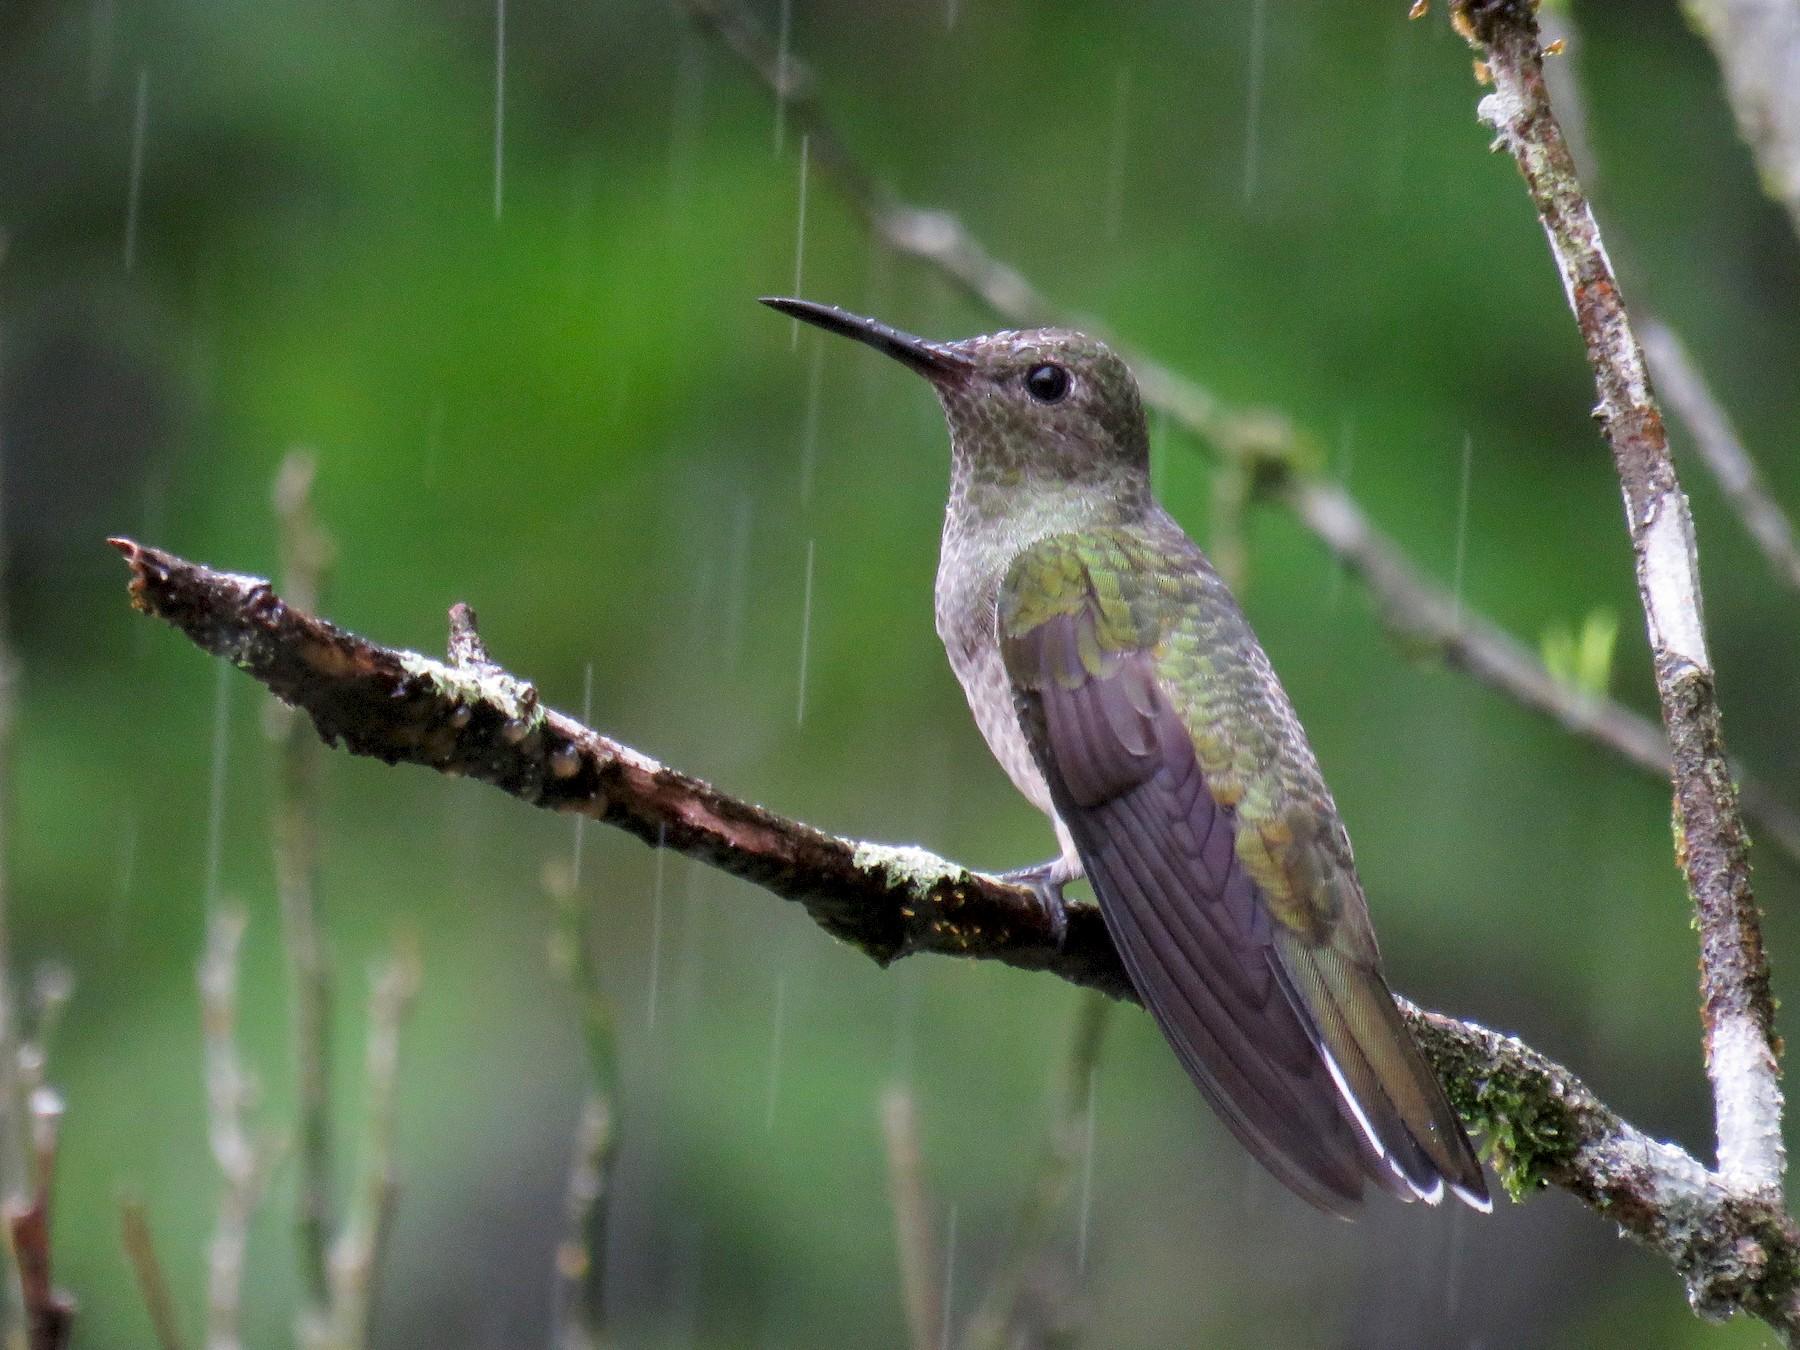 Scaly-breasted Hummingbird - John van Dort